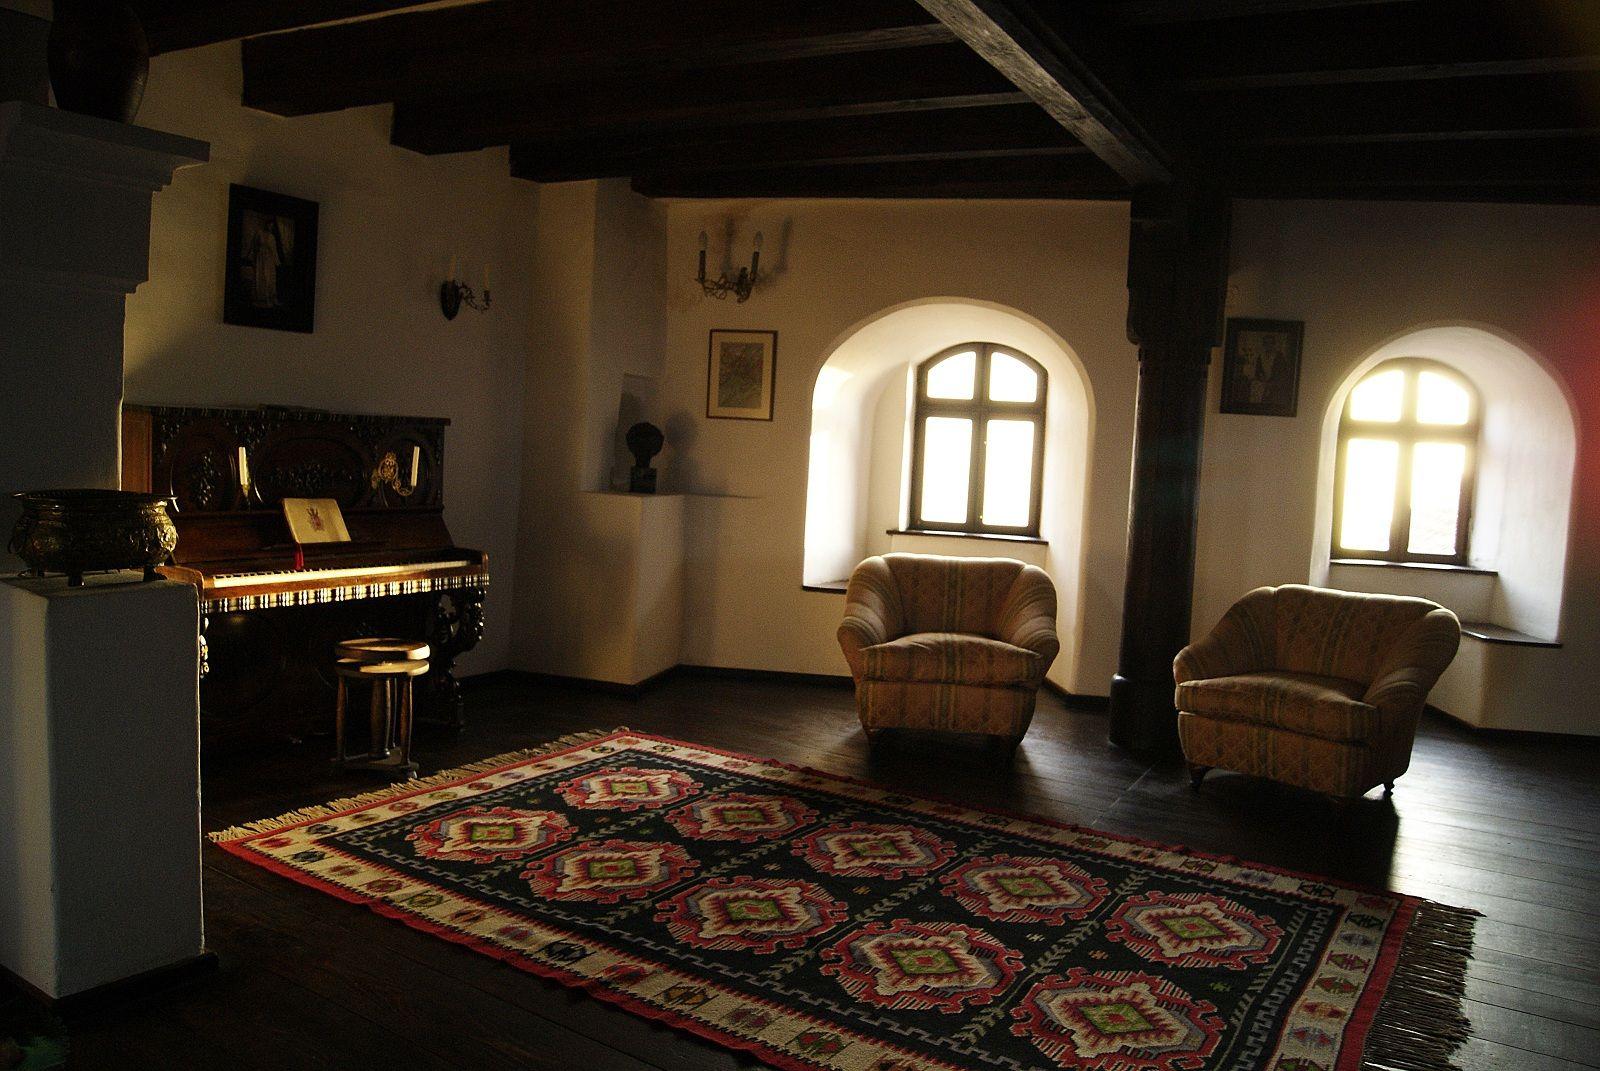 halloween holiday, brasov, romania, bran castle interior | my